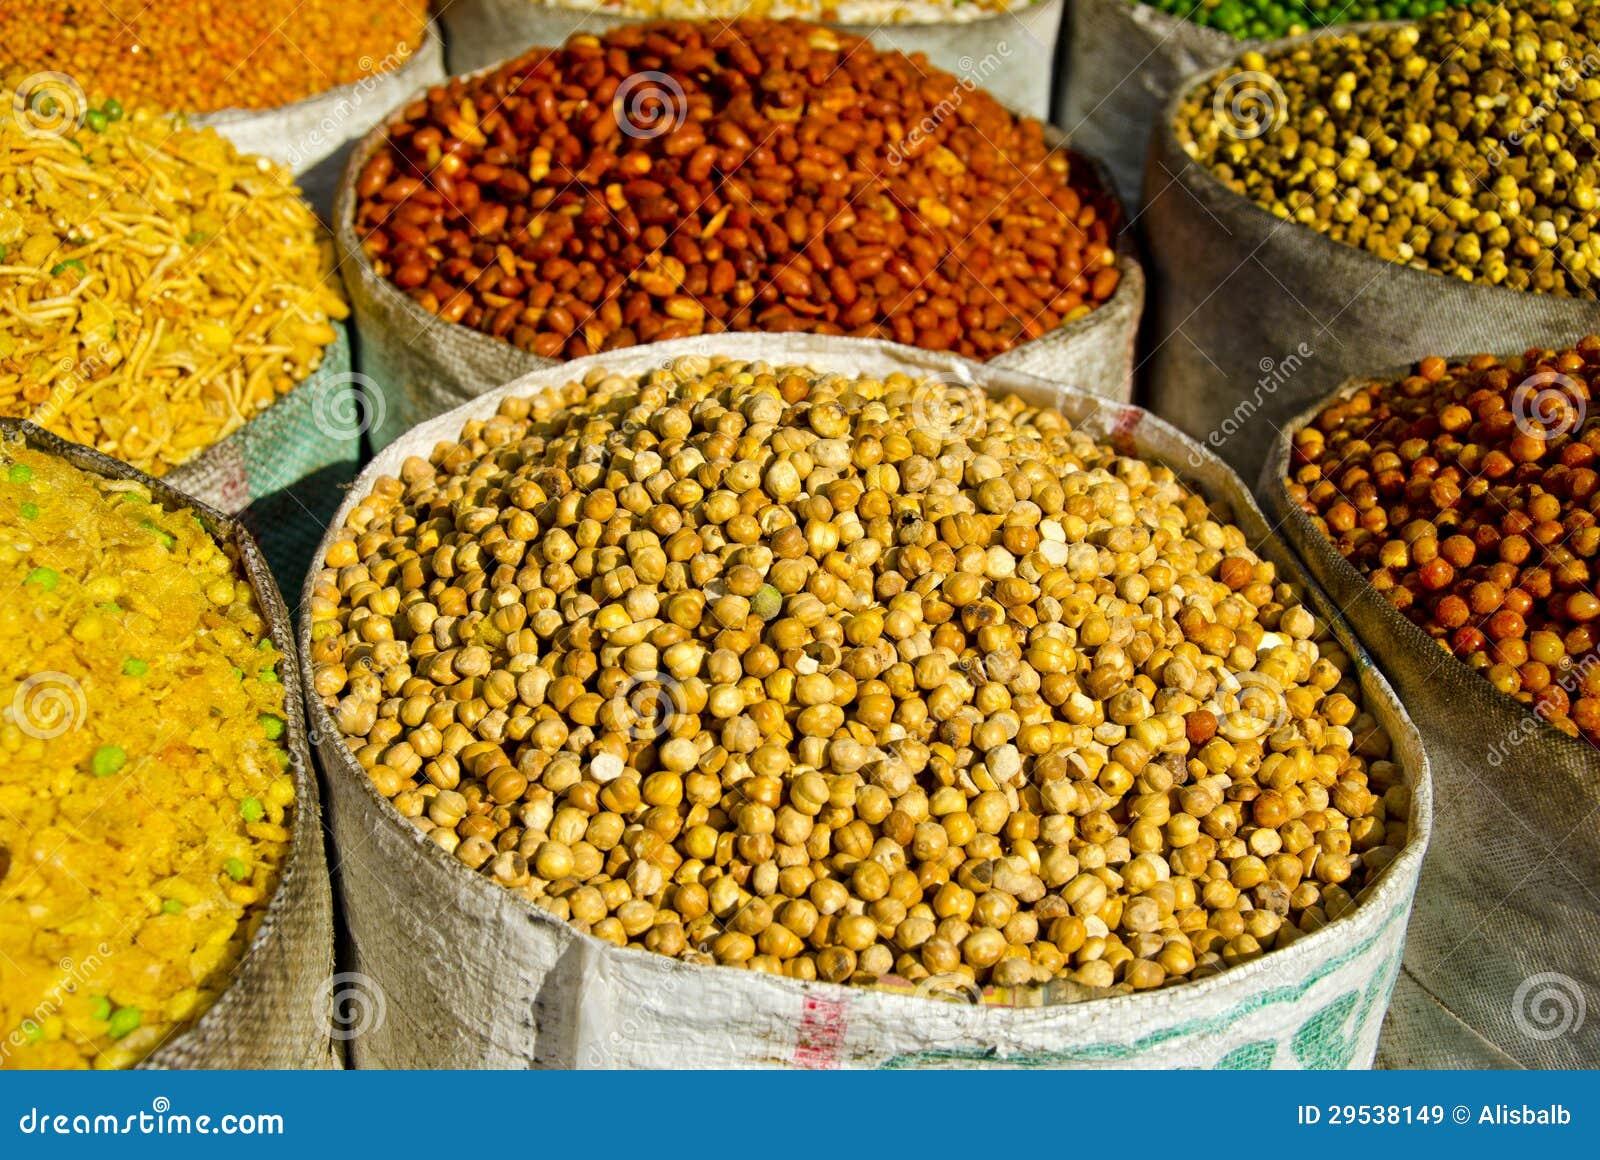 Pilhas do alimento no bazar da rua de Deli, India